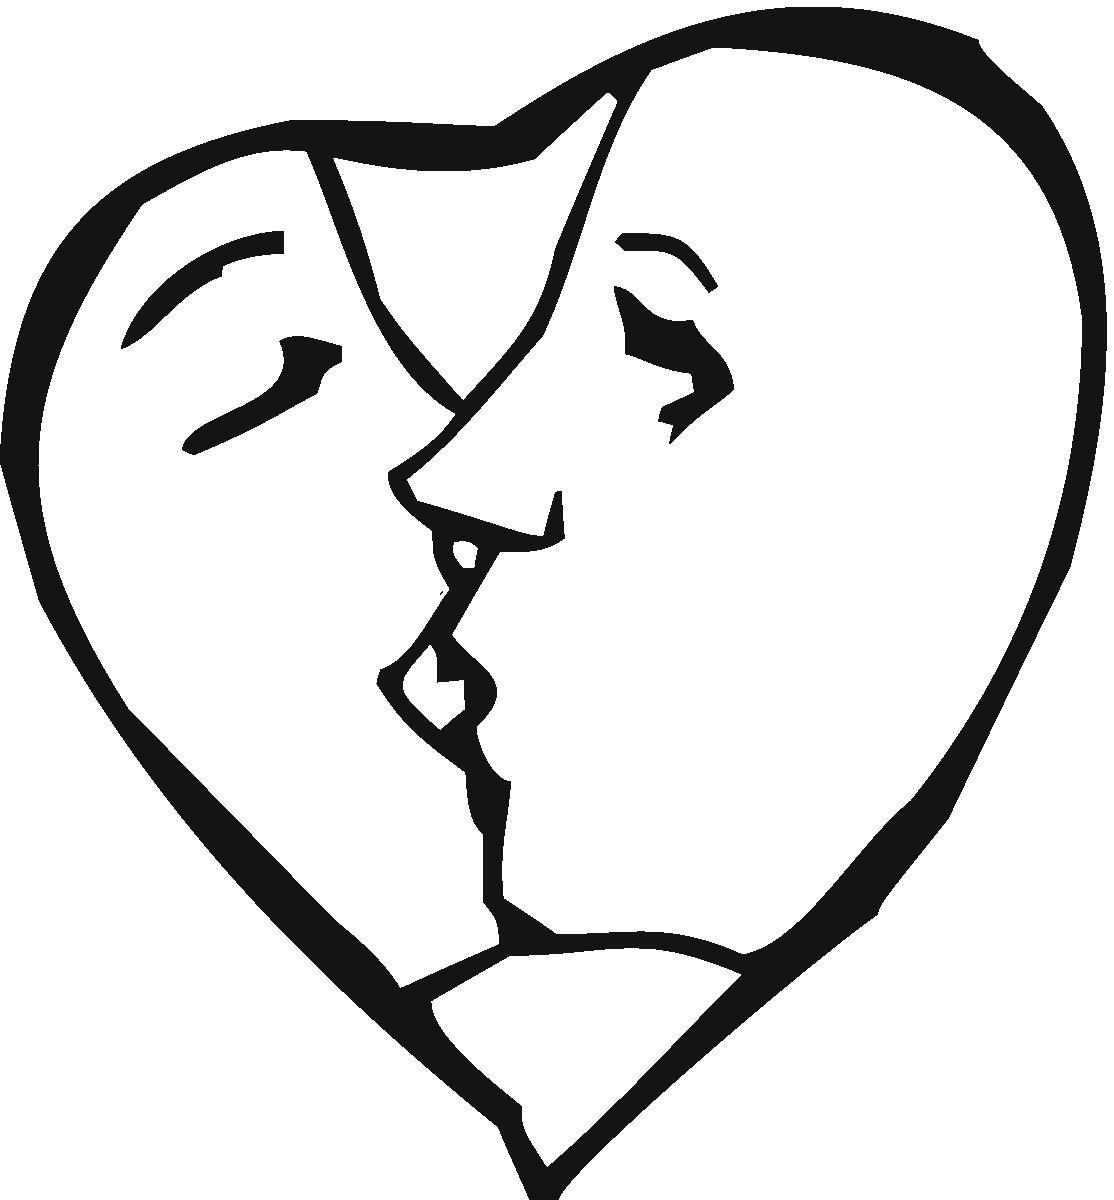 Royal blue heart clipart clipart panda free clipart images for Immagini di disegni facili